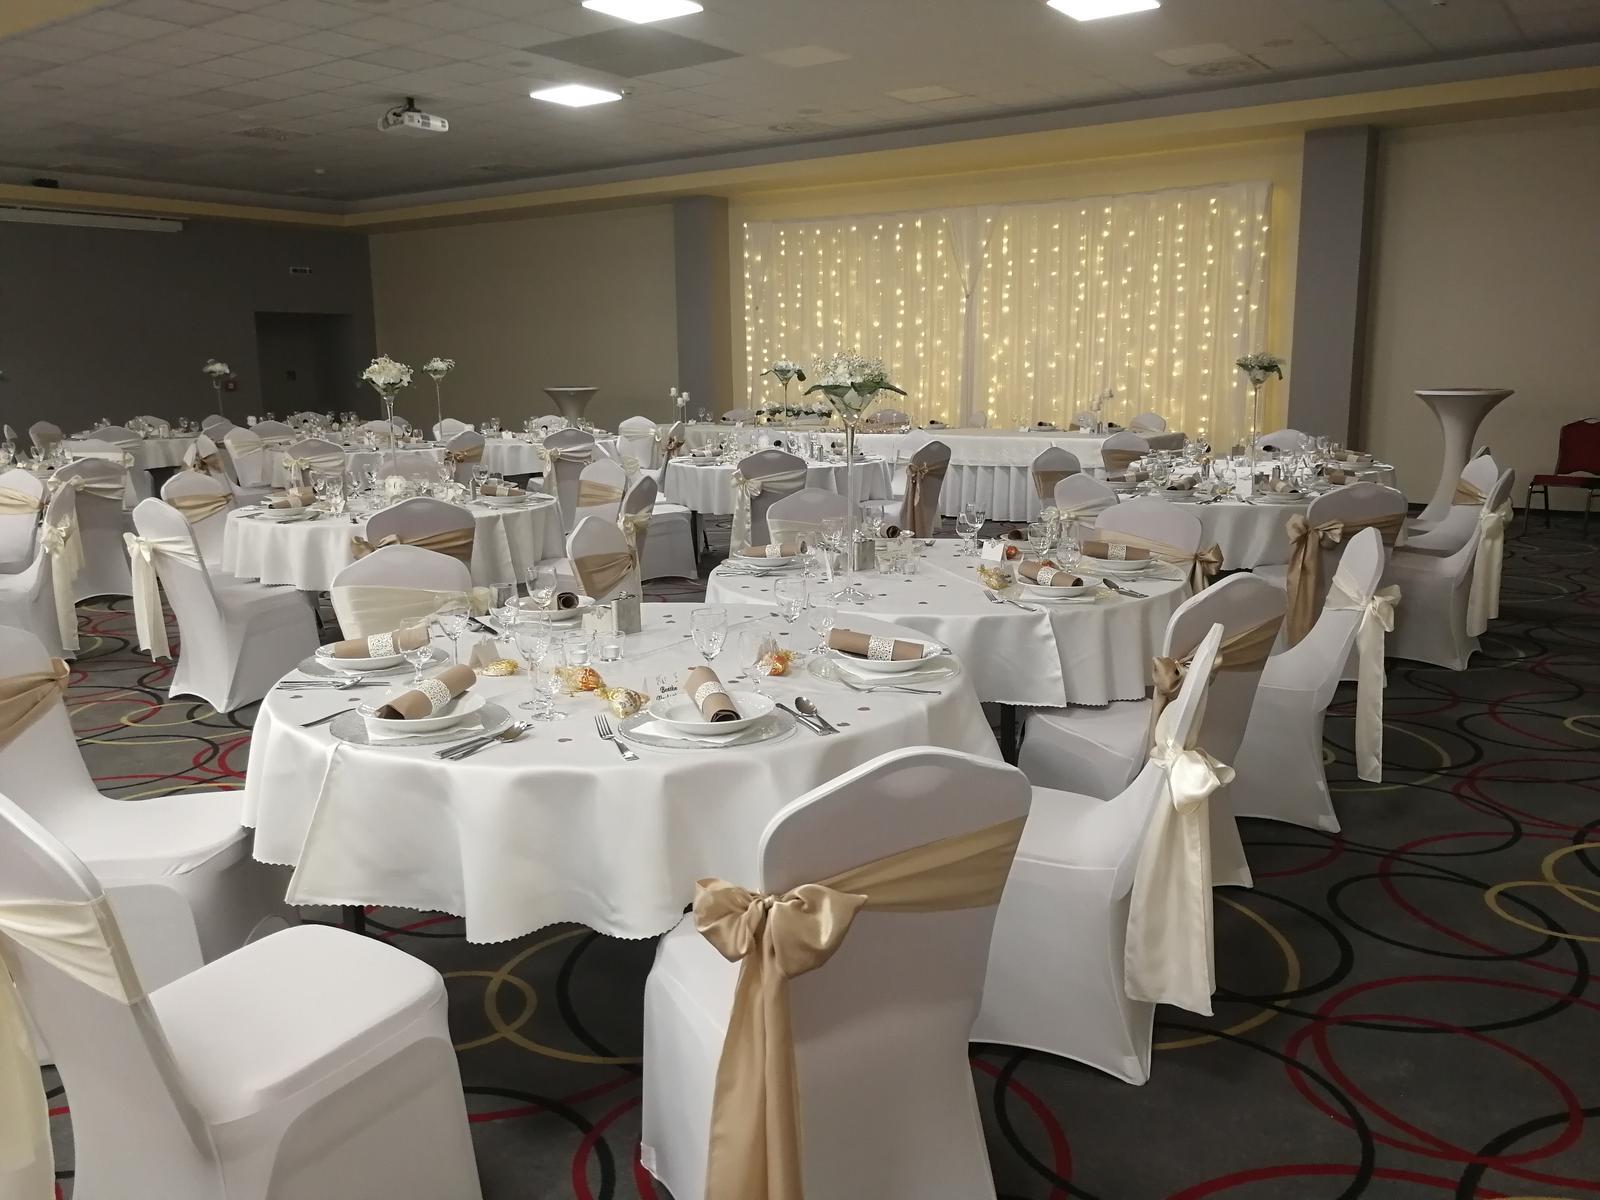 Svadba 7.4.2018 Zvolen Hotel TENIS - Obrázok č. 16